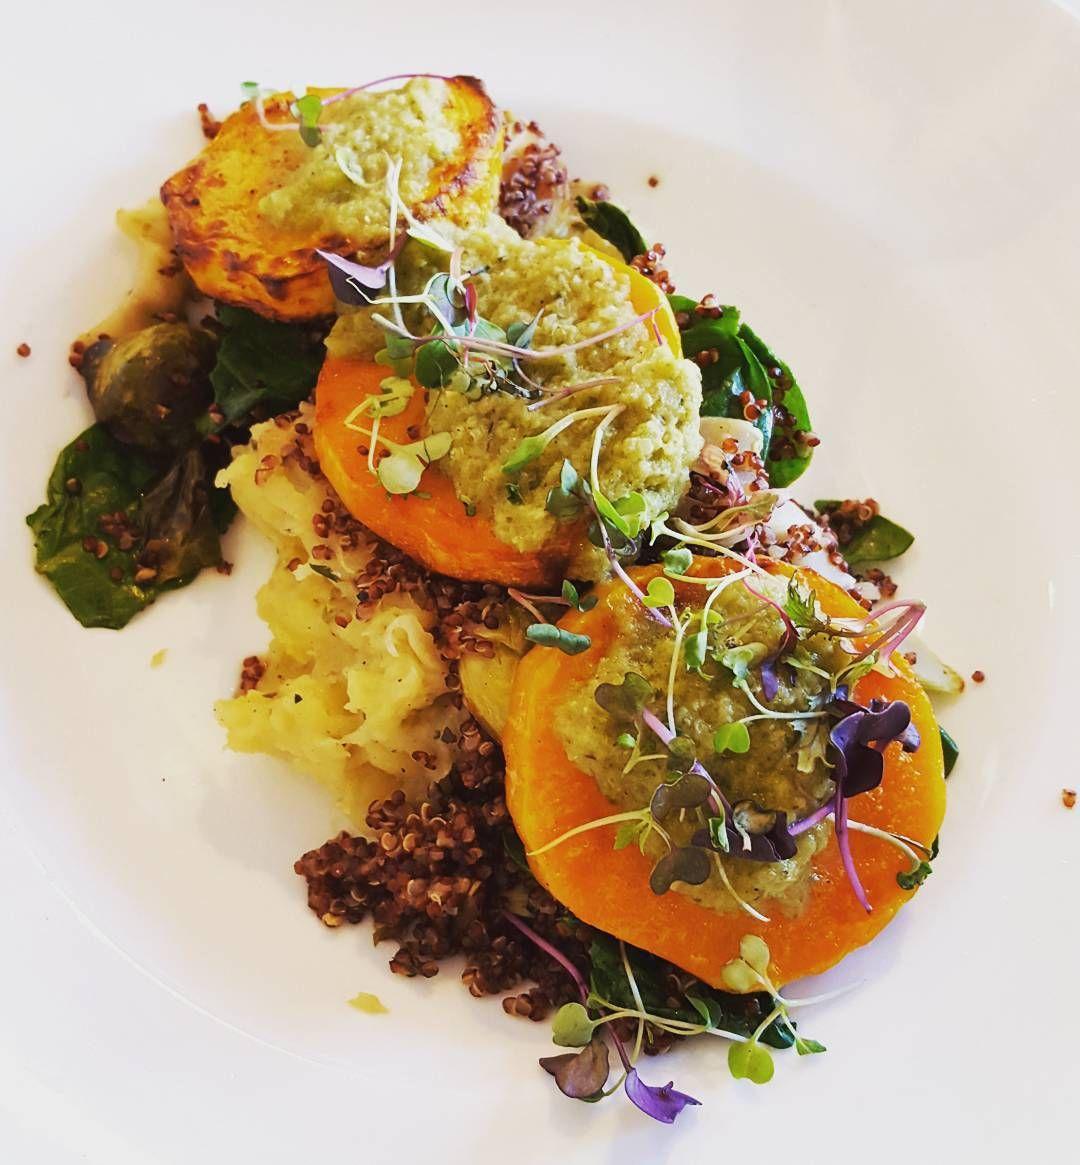 Vegan Wedding Food: Vegan Butternut Squash, Mashed Potato, Quinoa, Spinach And